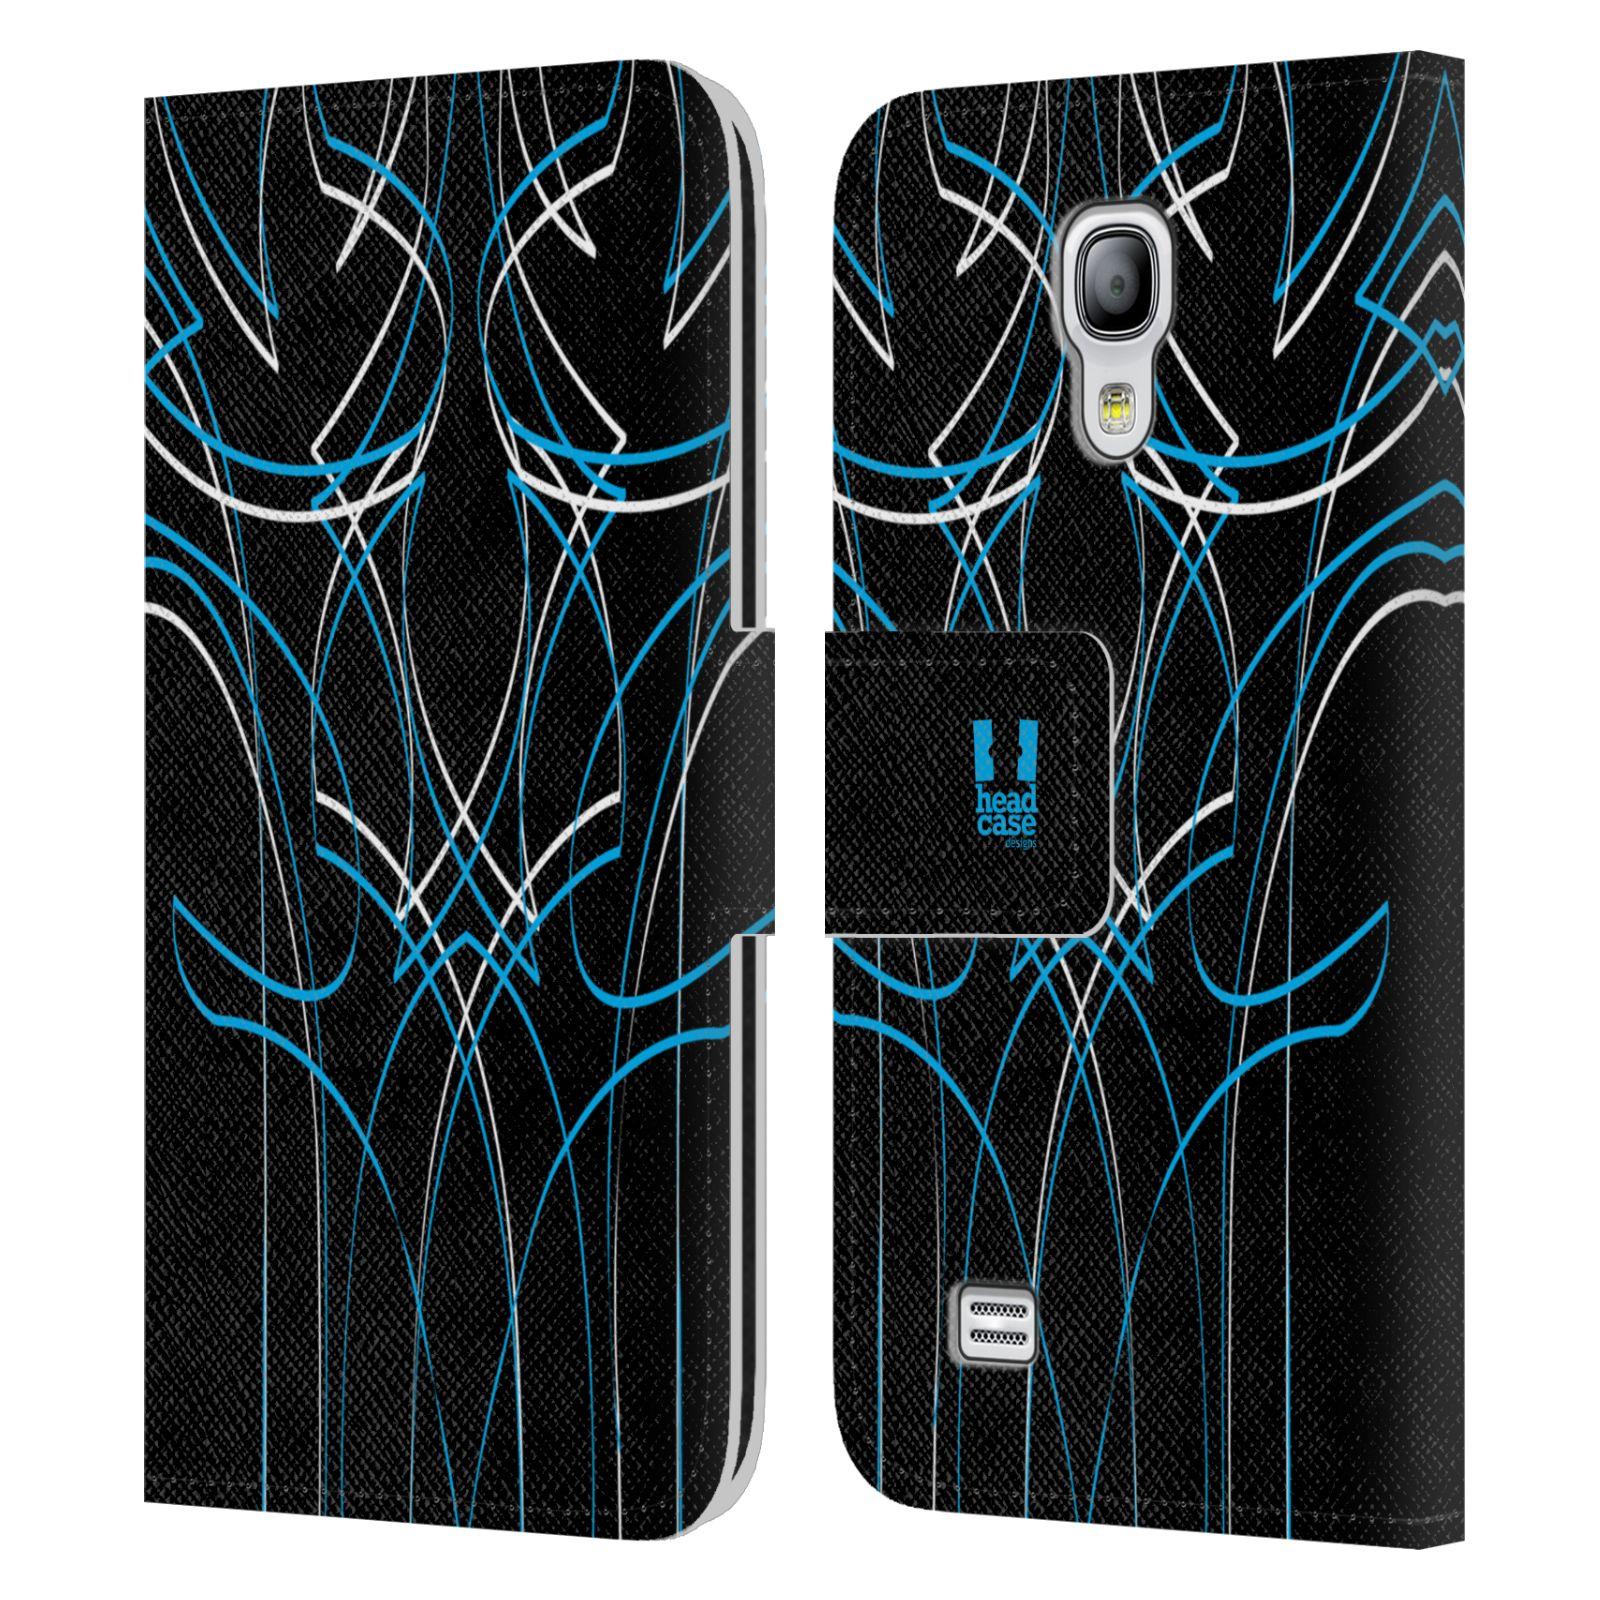 HEAD CASE Flipové pouzdro pro mobil Samsung Galaxy S4 MINI / S4 MINI DUOS barevné proužky tvary modrá